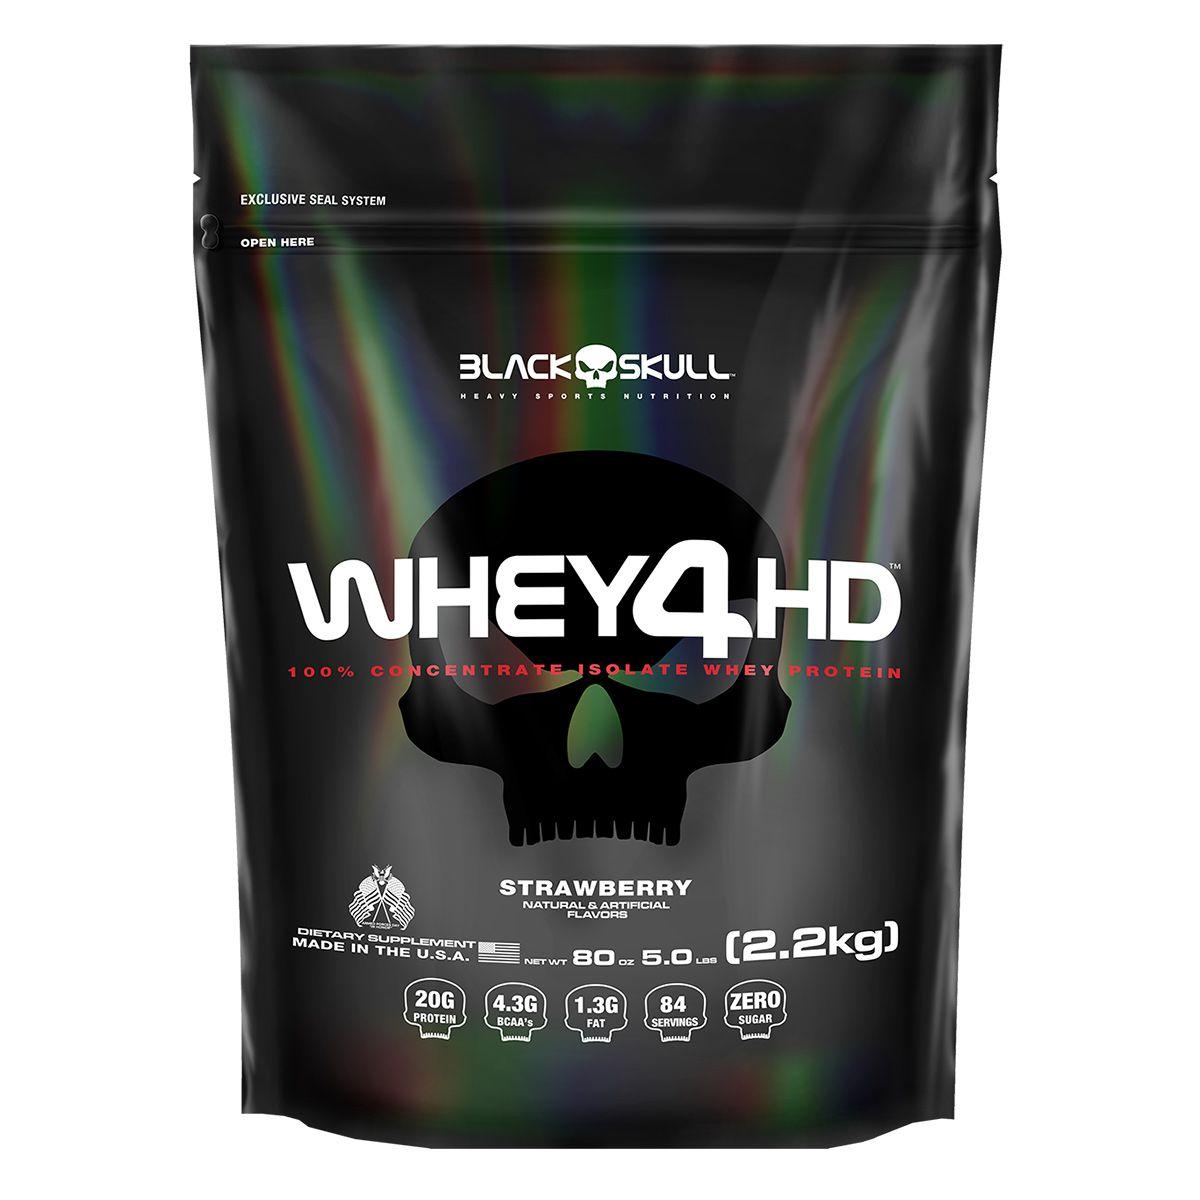 Whey Protein Refil 4 HD - 2.2 Kg